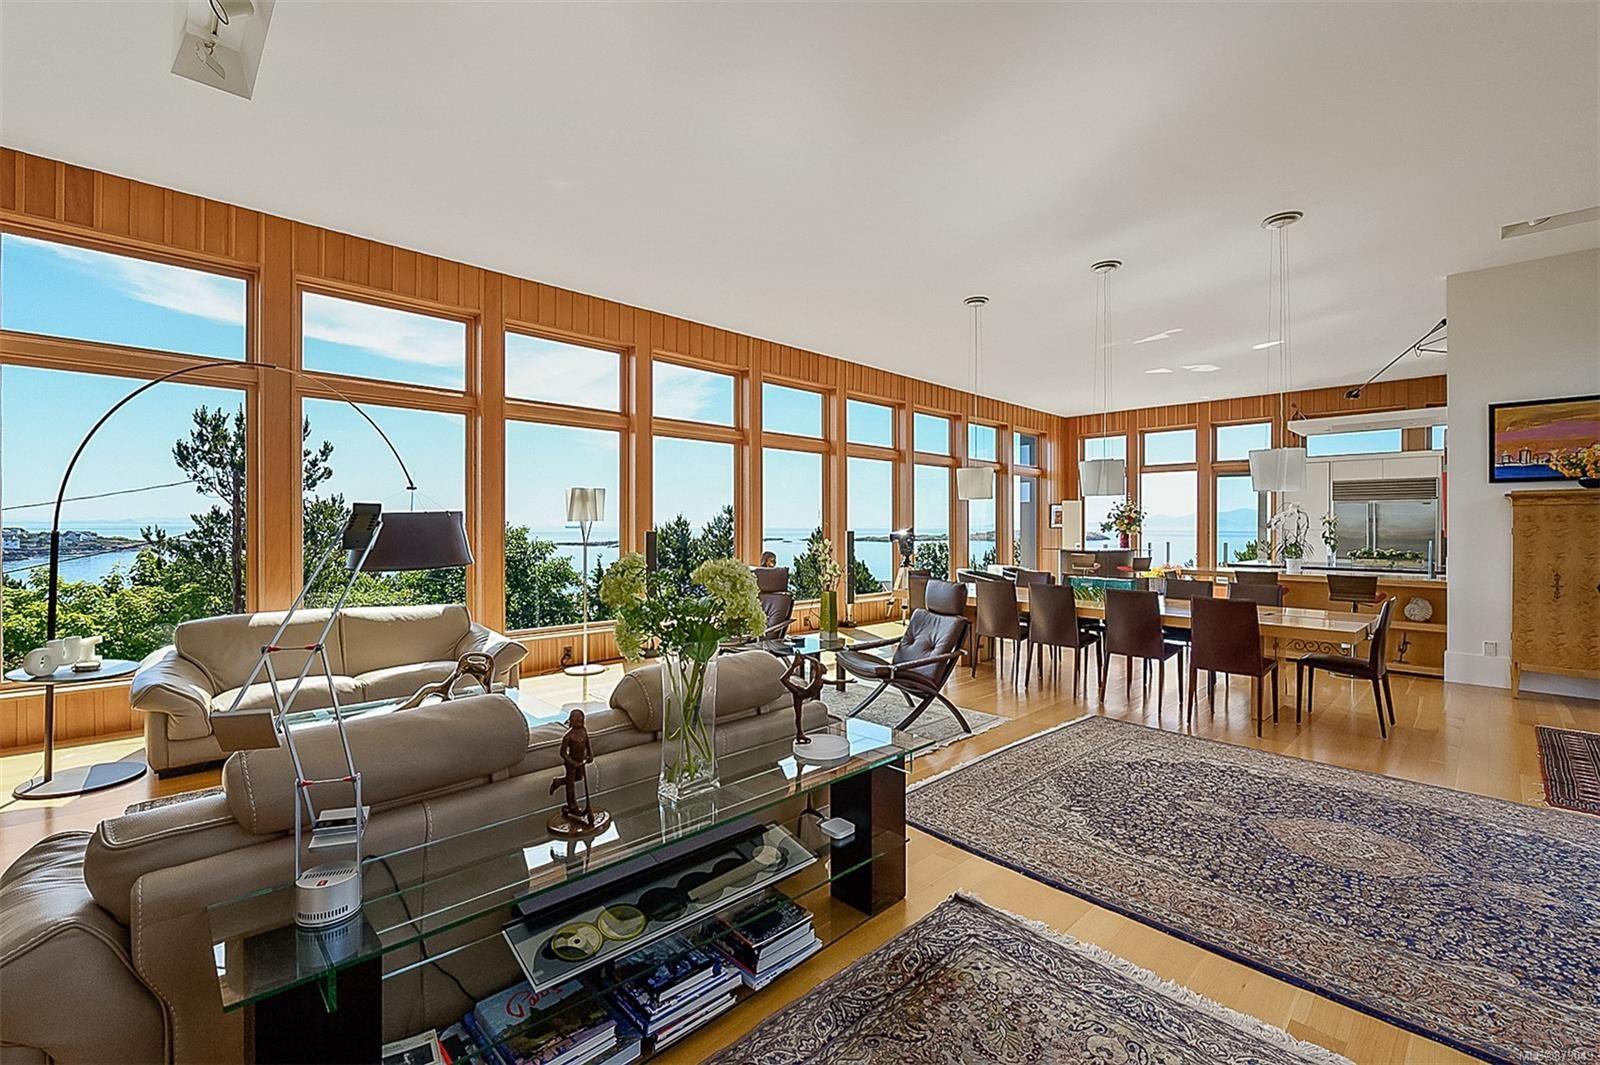 Main Photo: 285 King George Terr in Oak Bay: OB Gonzales House for sale : MLS®# 879049